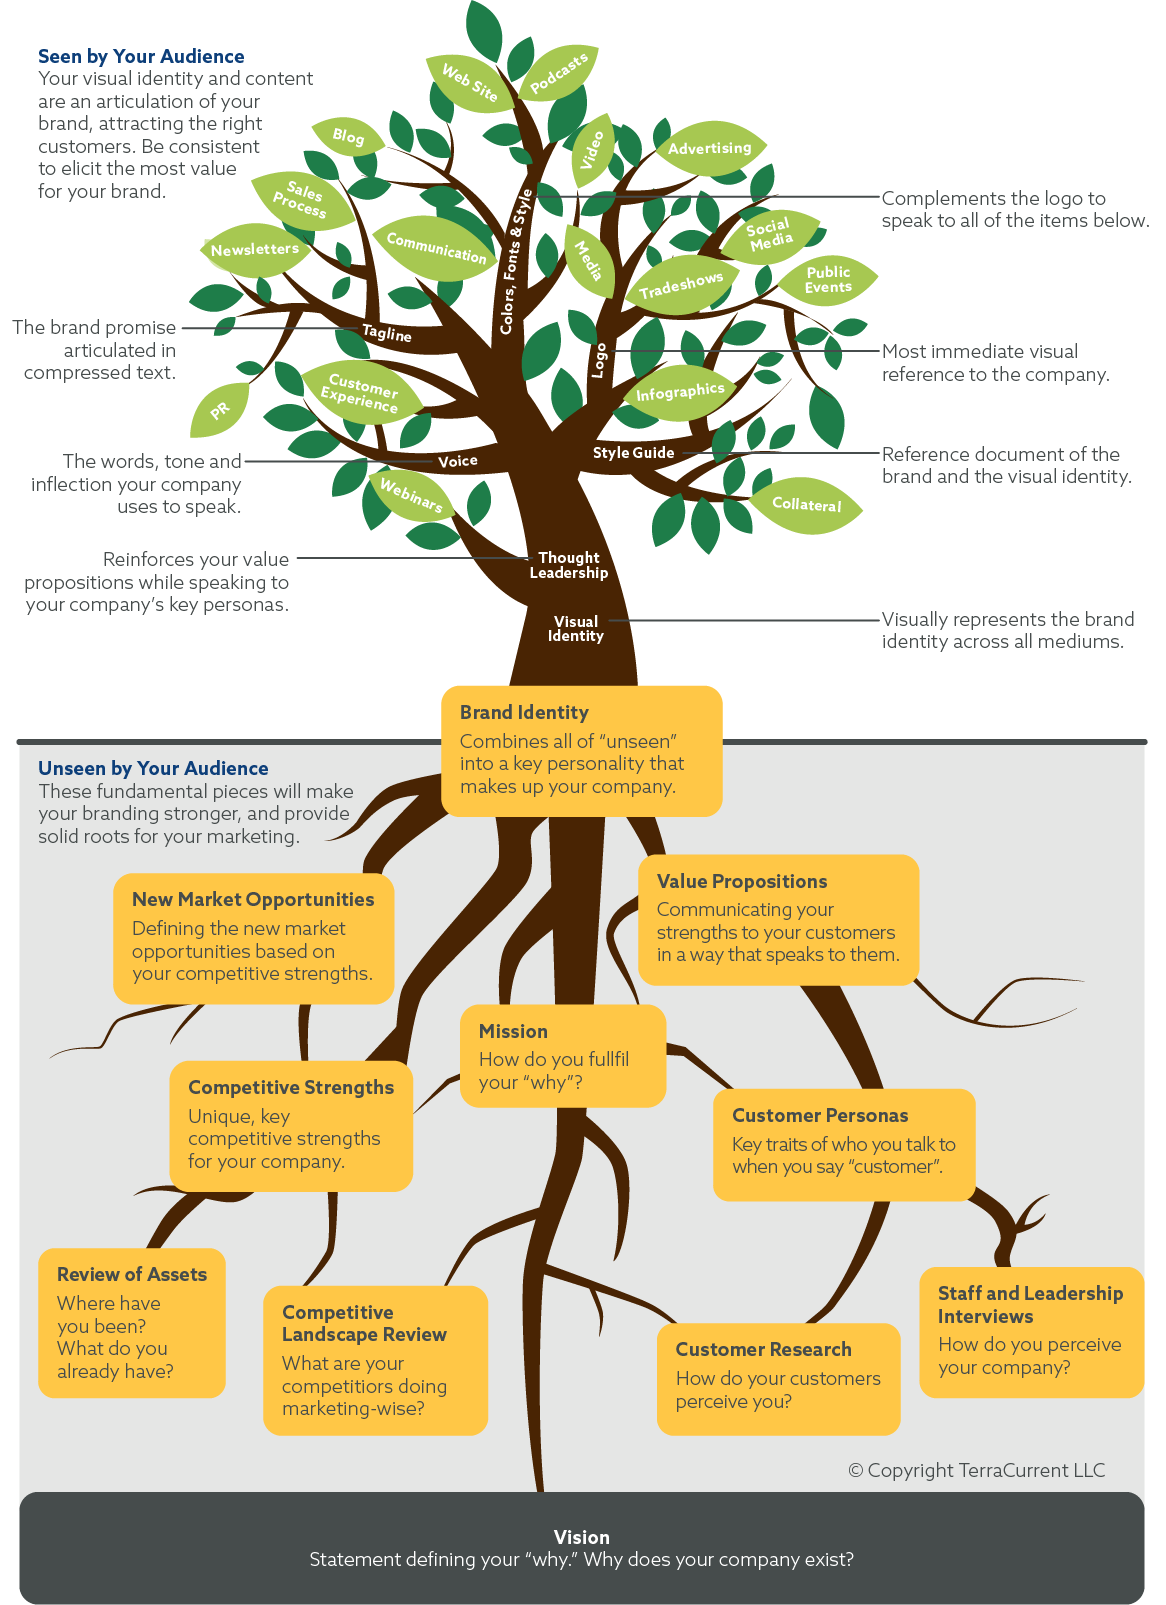 TerraCurrent branding tree image